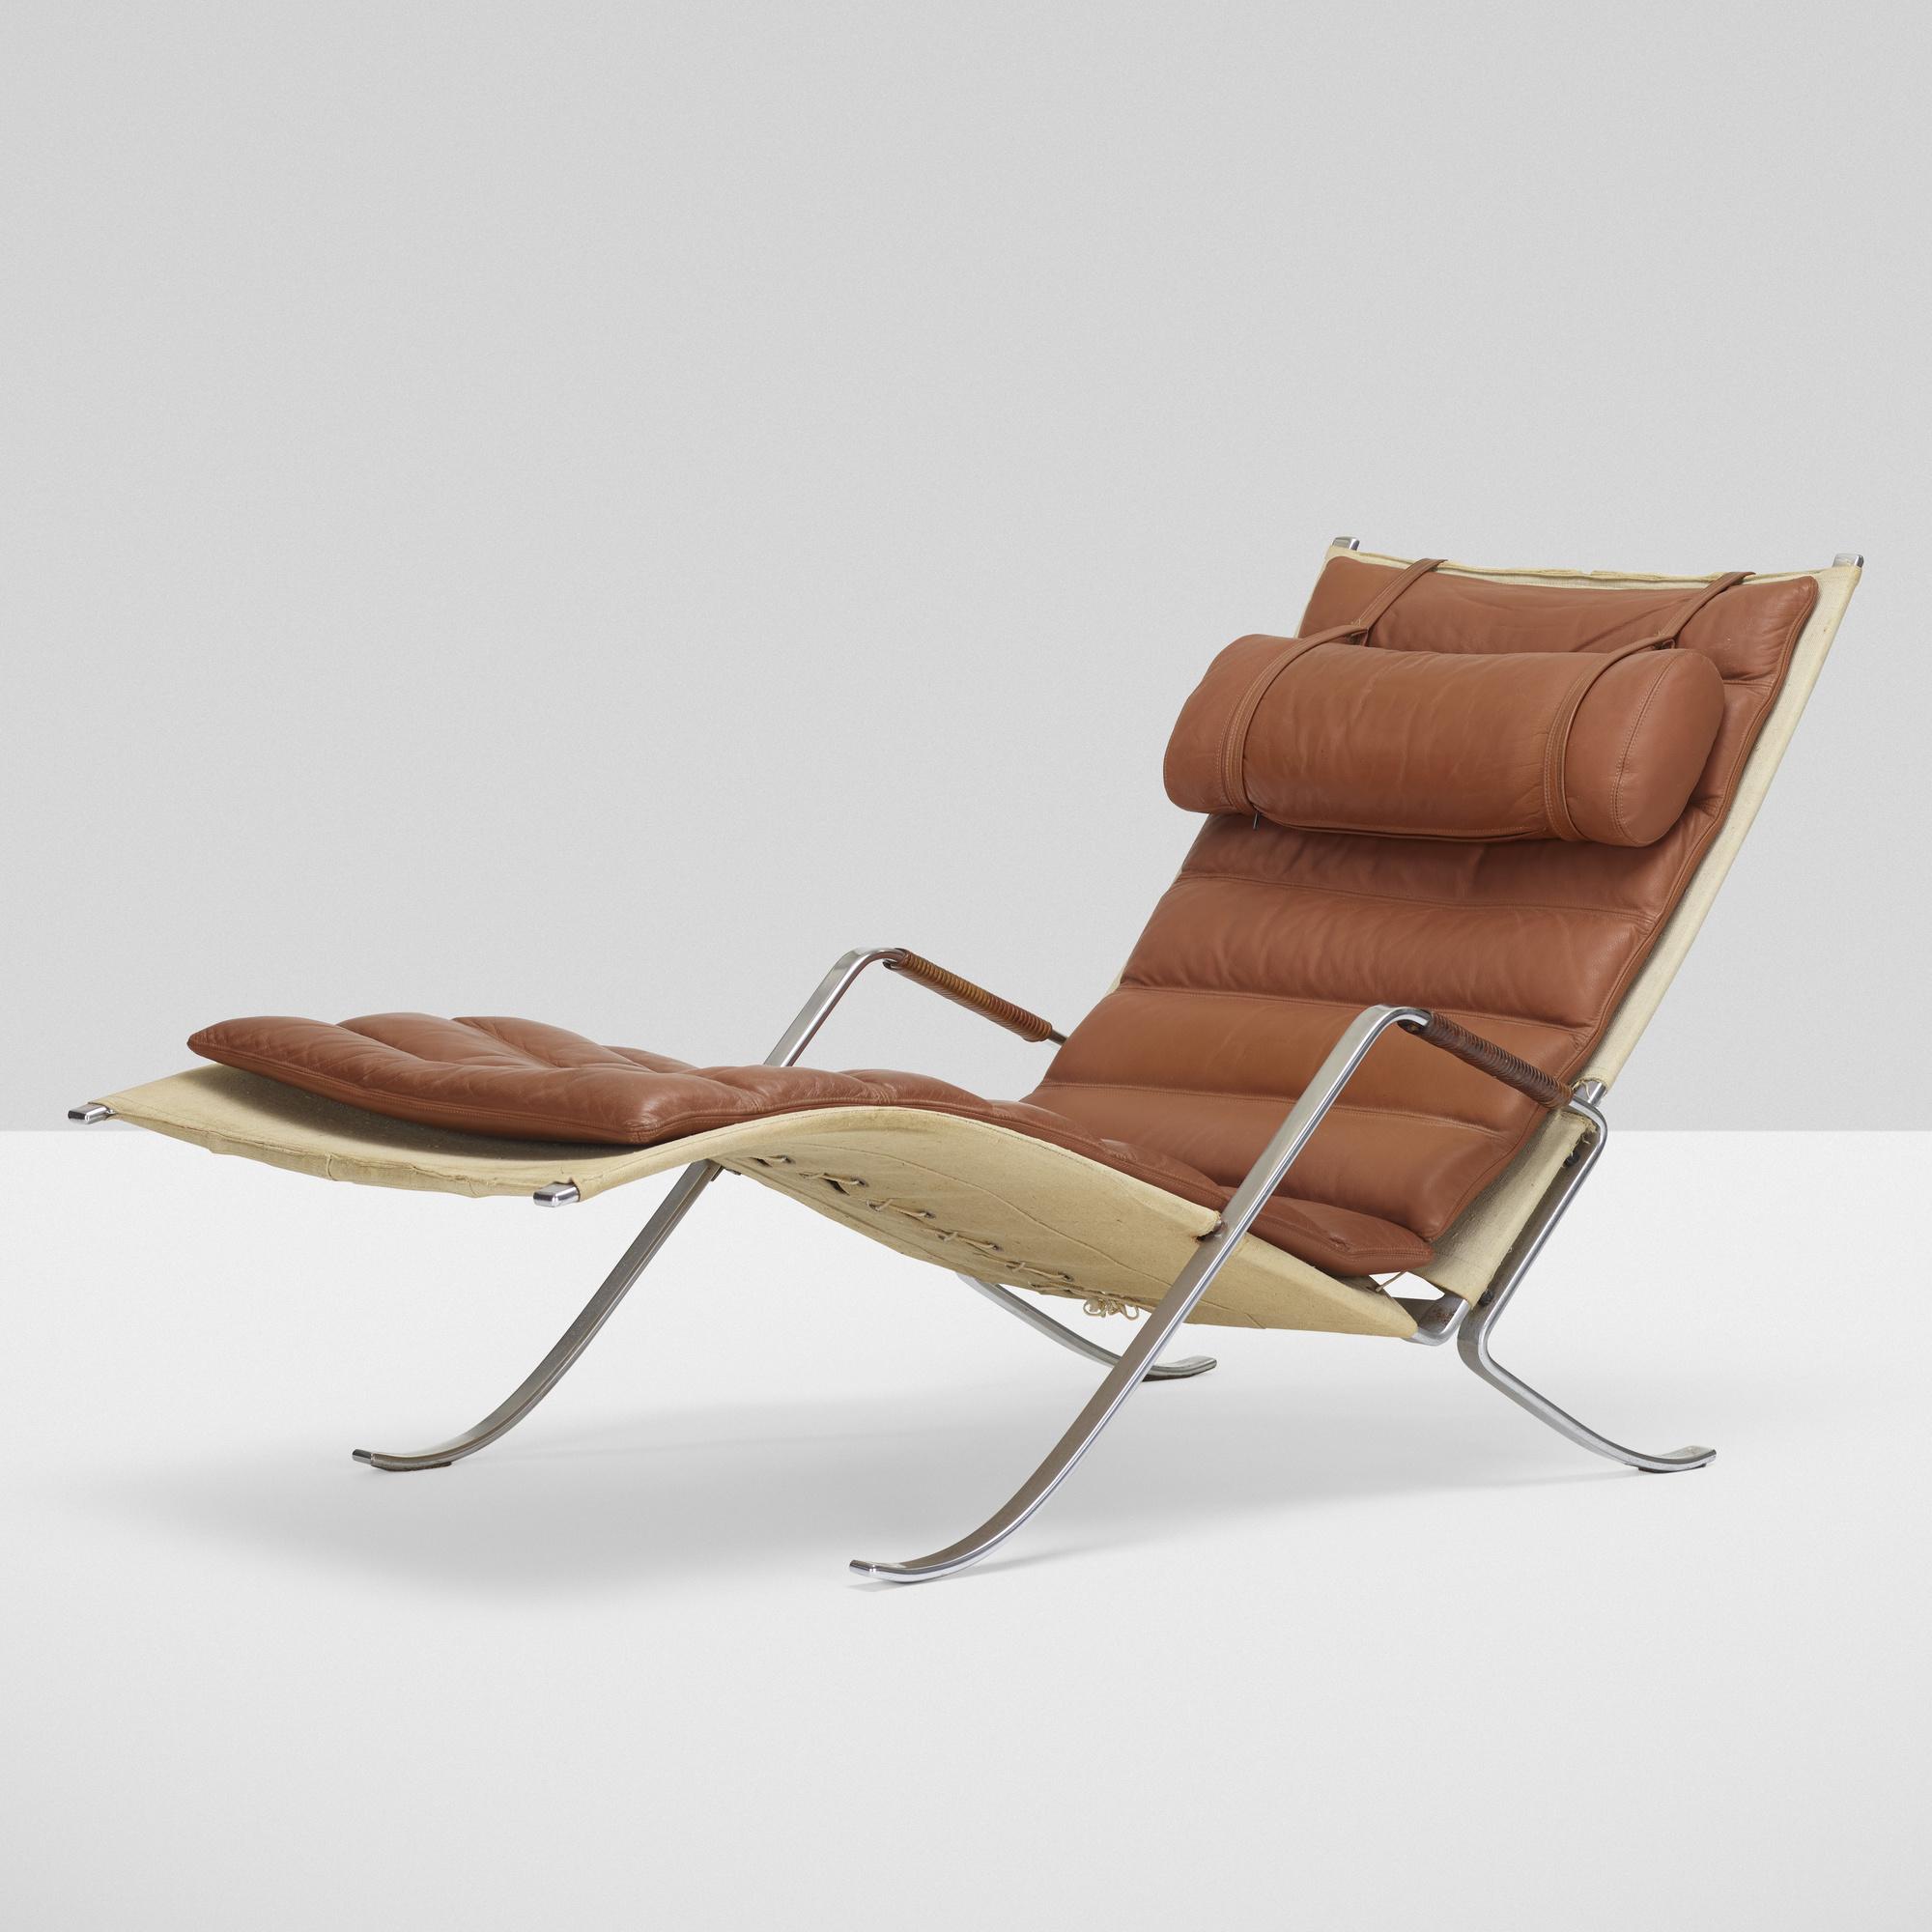 201: PREBEN FABRICIUS AND JØRGEN KASTHOLM, Grasshopper chaise lounge